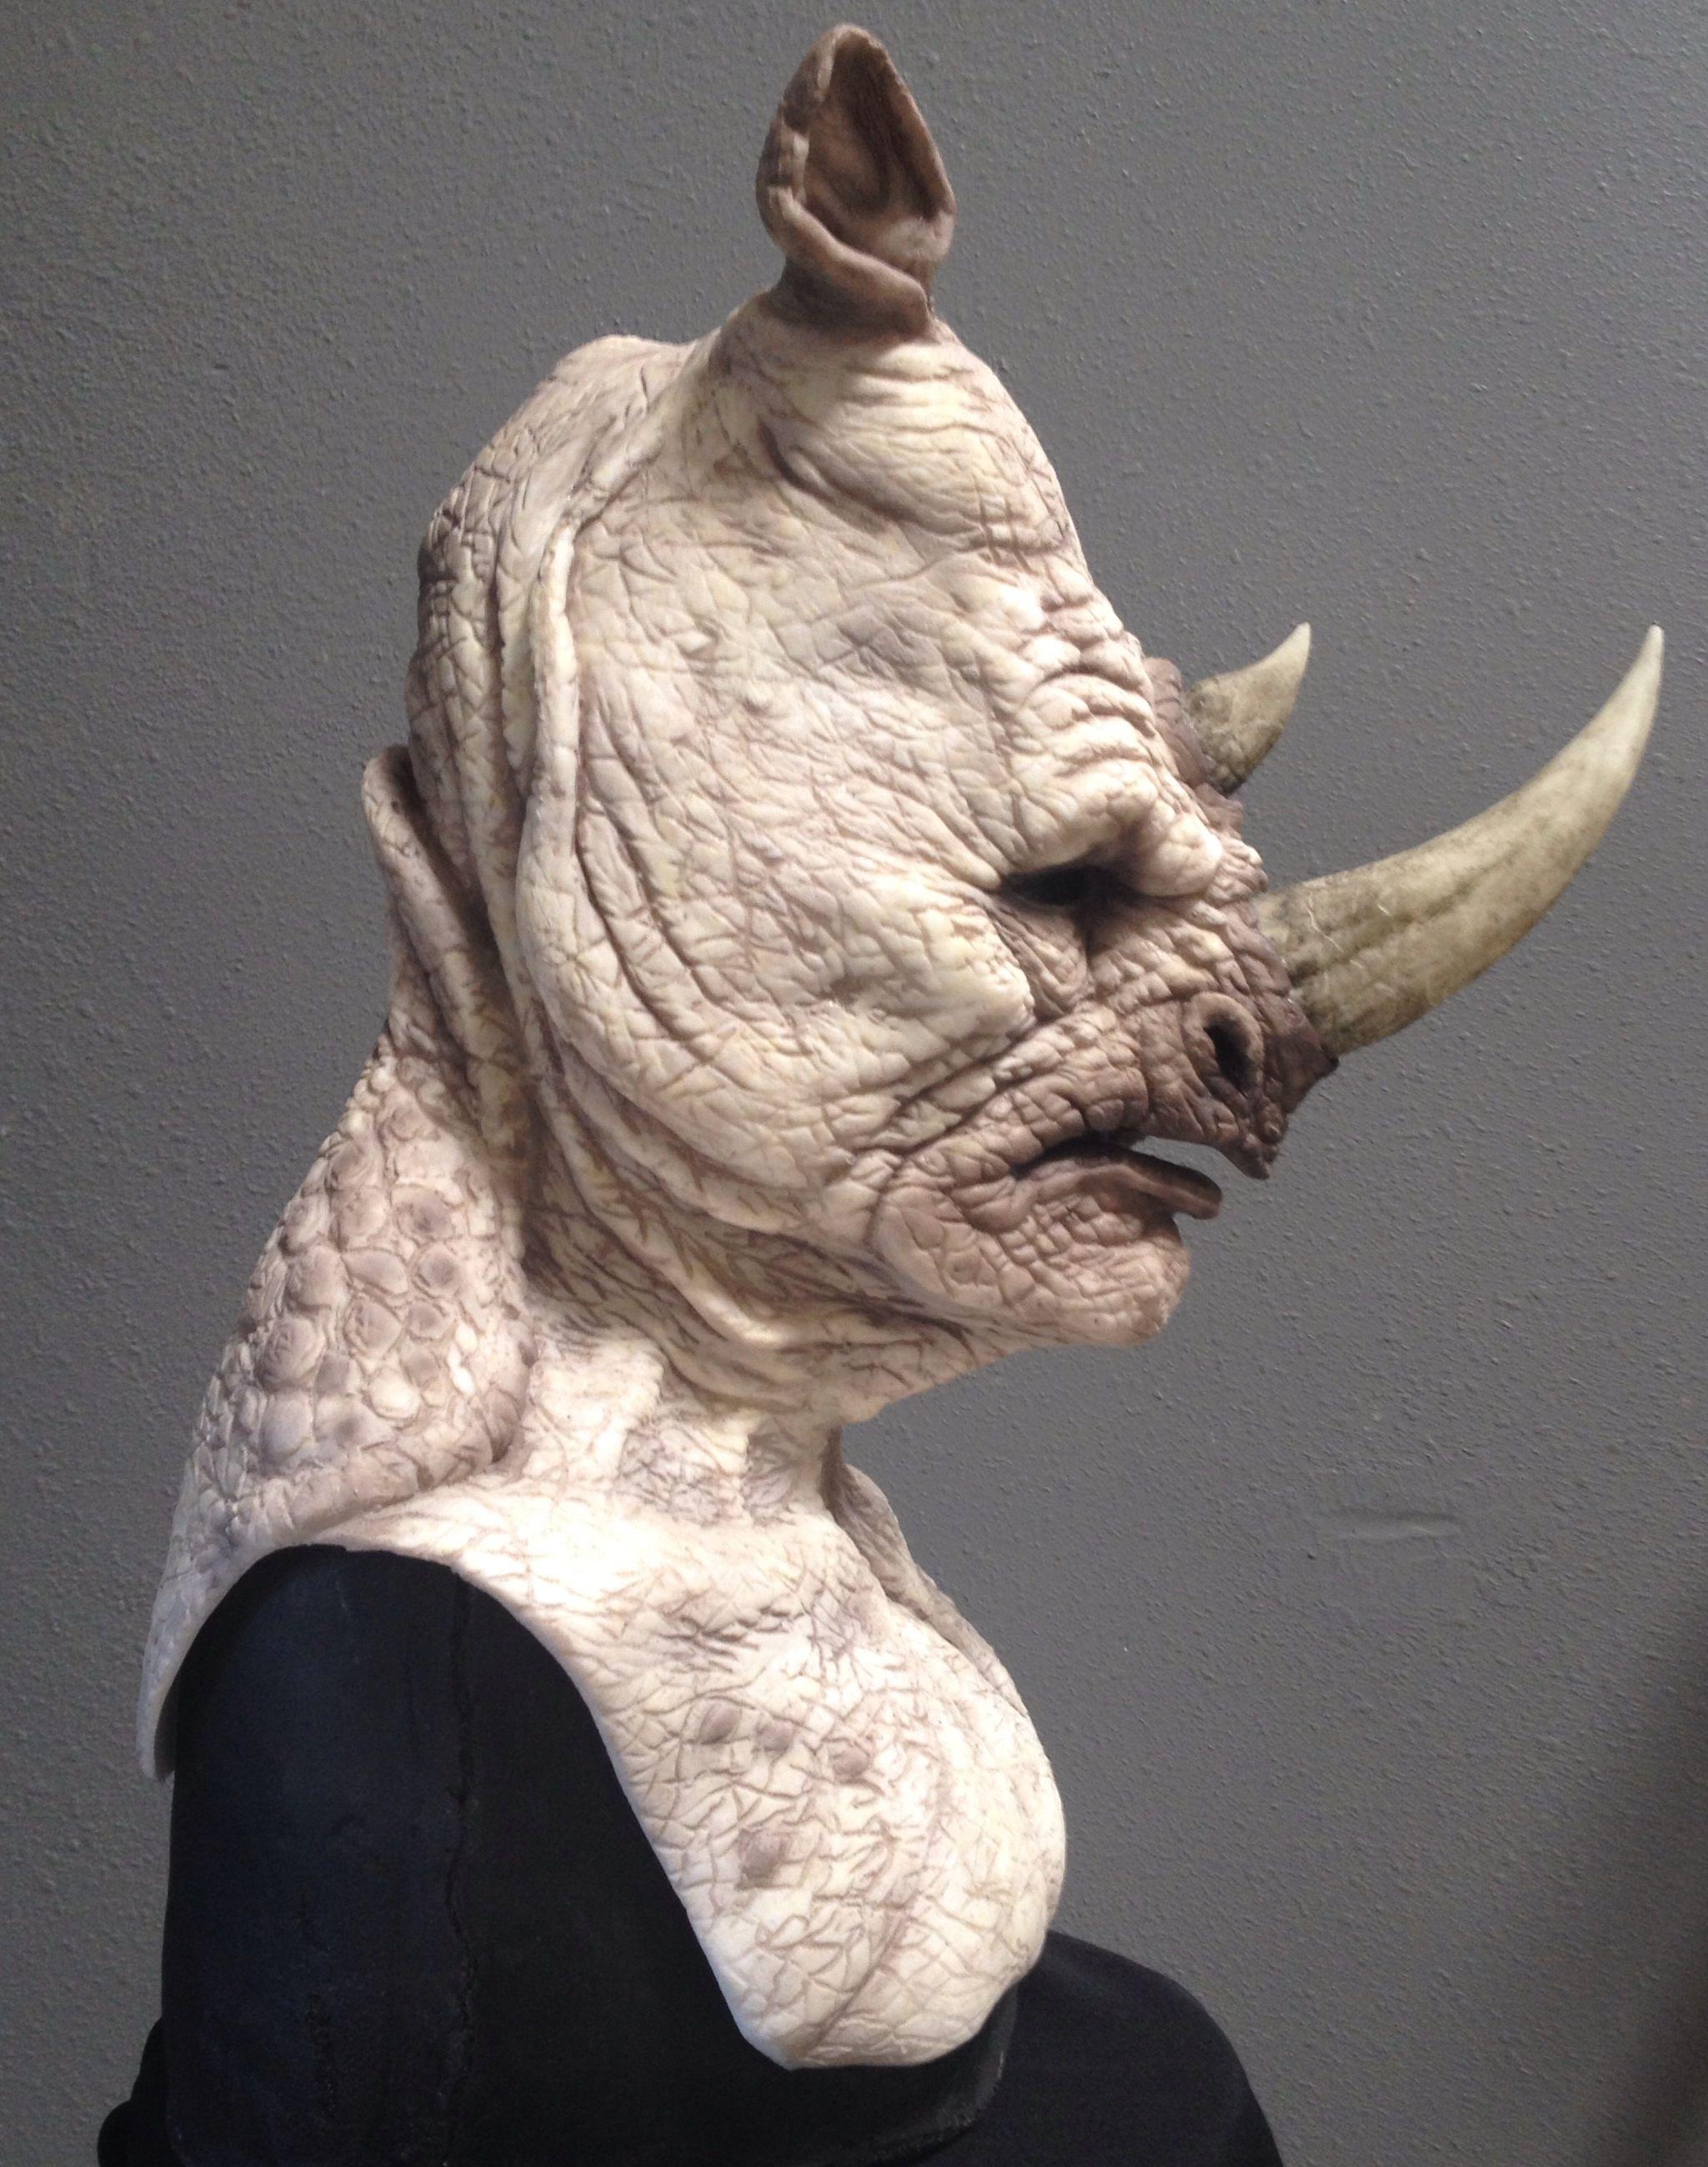 Immortal Masks Immortal Masks Animal Masks Creature Design Immortal masks @immortalmasks the world's leading silicone mask company. pinterest